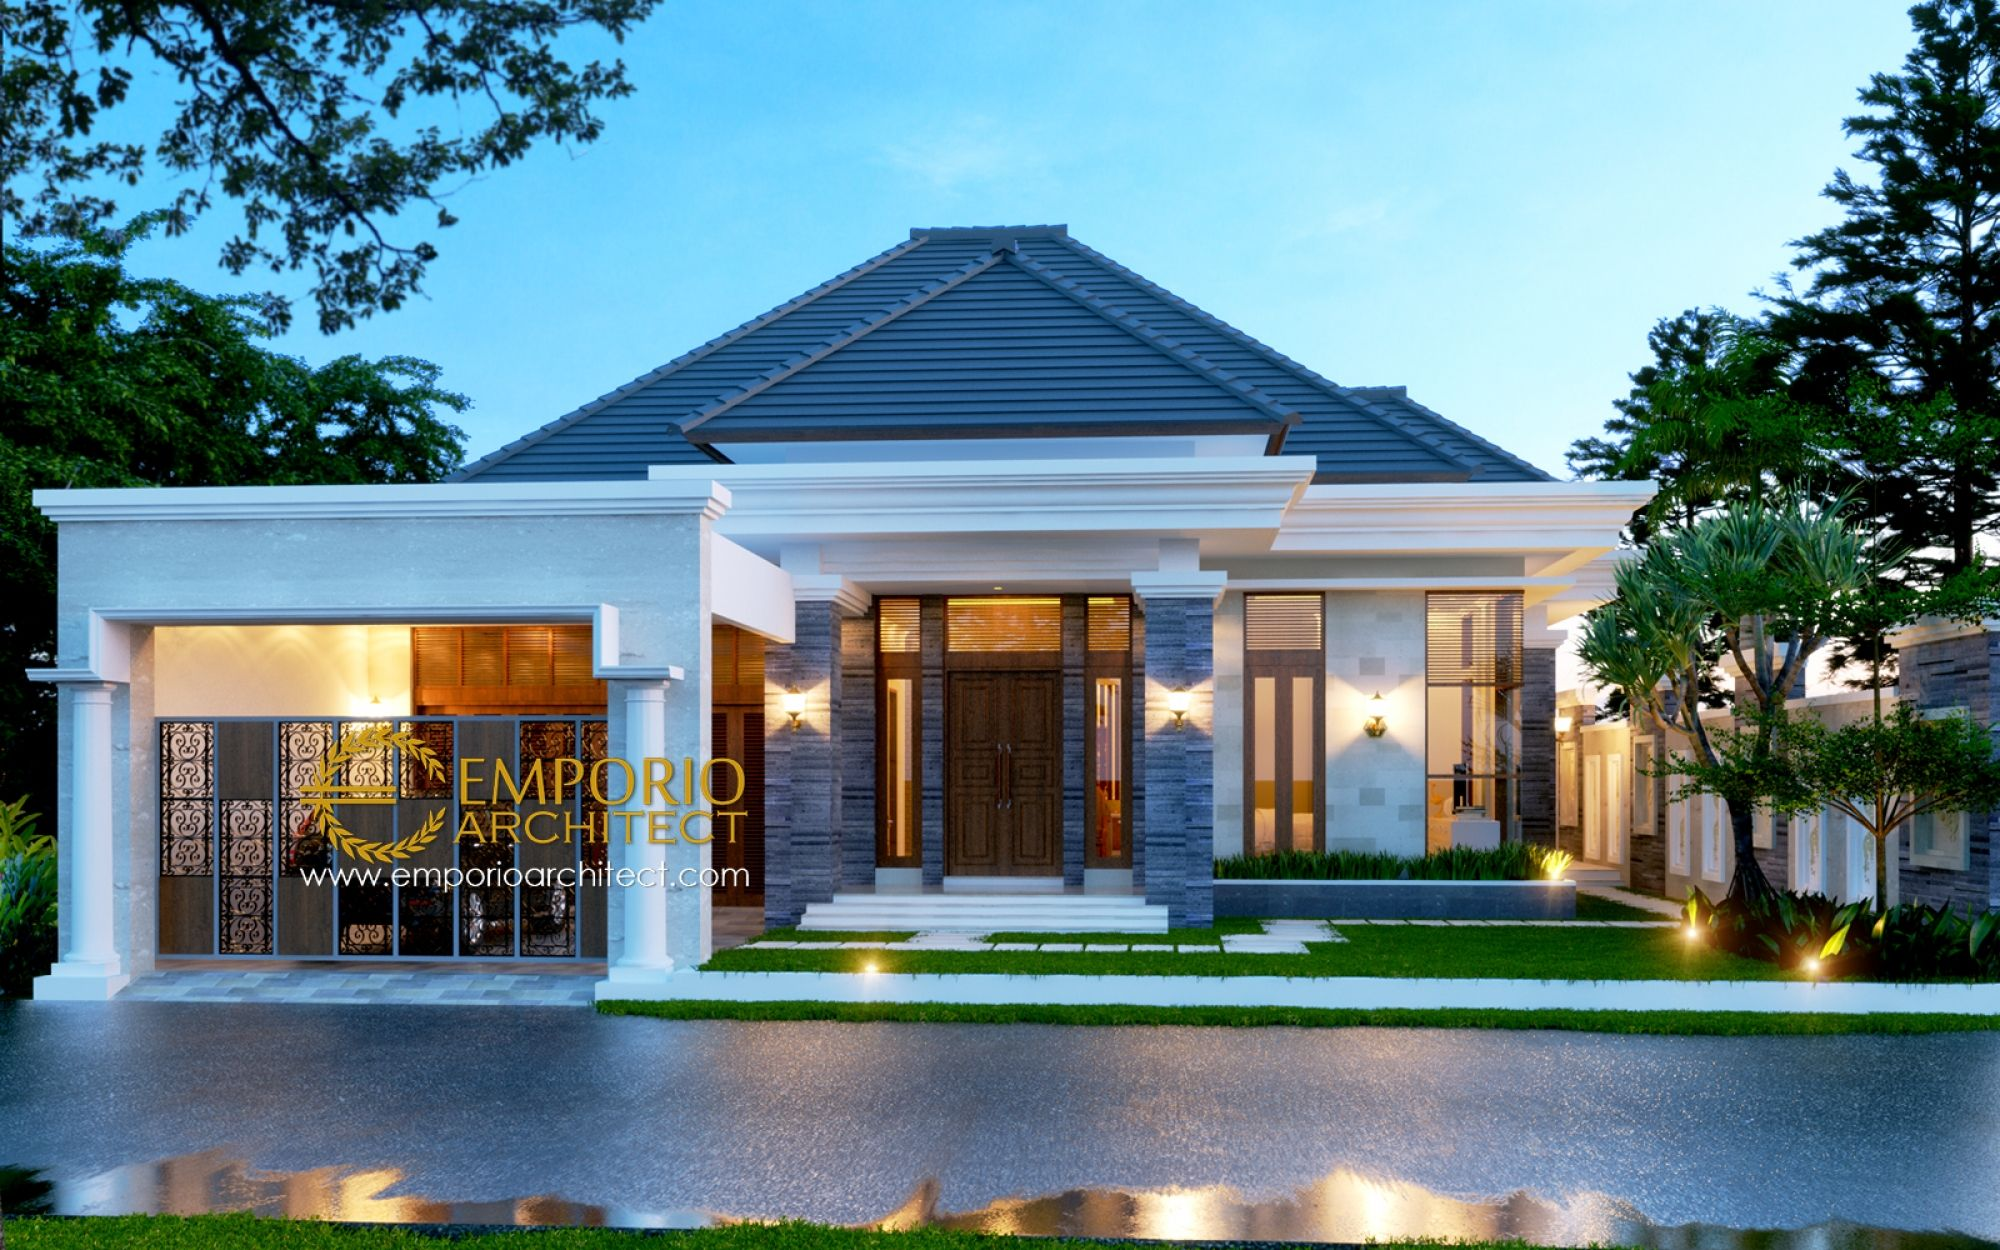 Jasa arsitek medan desain rumah bapak hilman lubis jasa arsitek desain rumah berkualitas desain villa